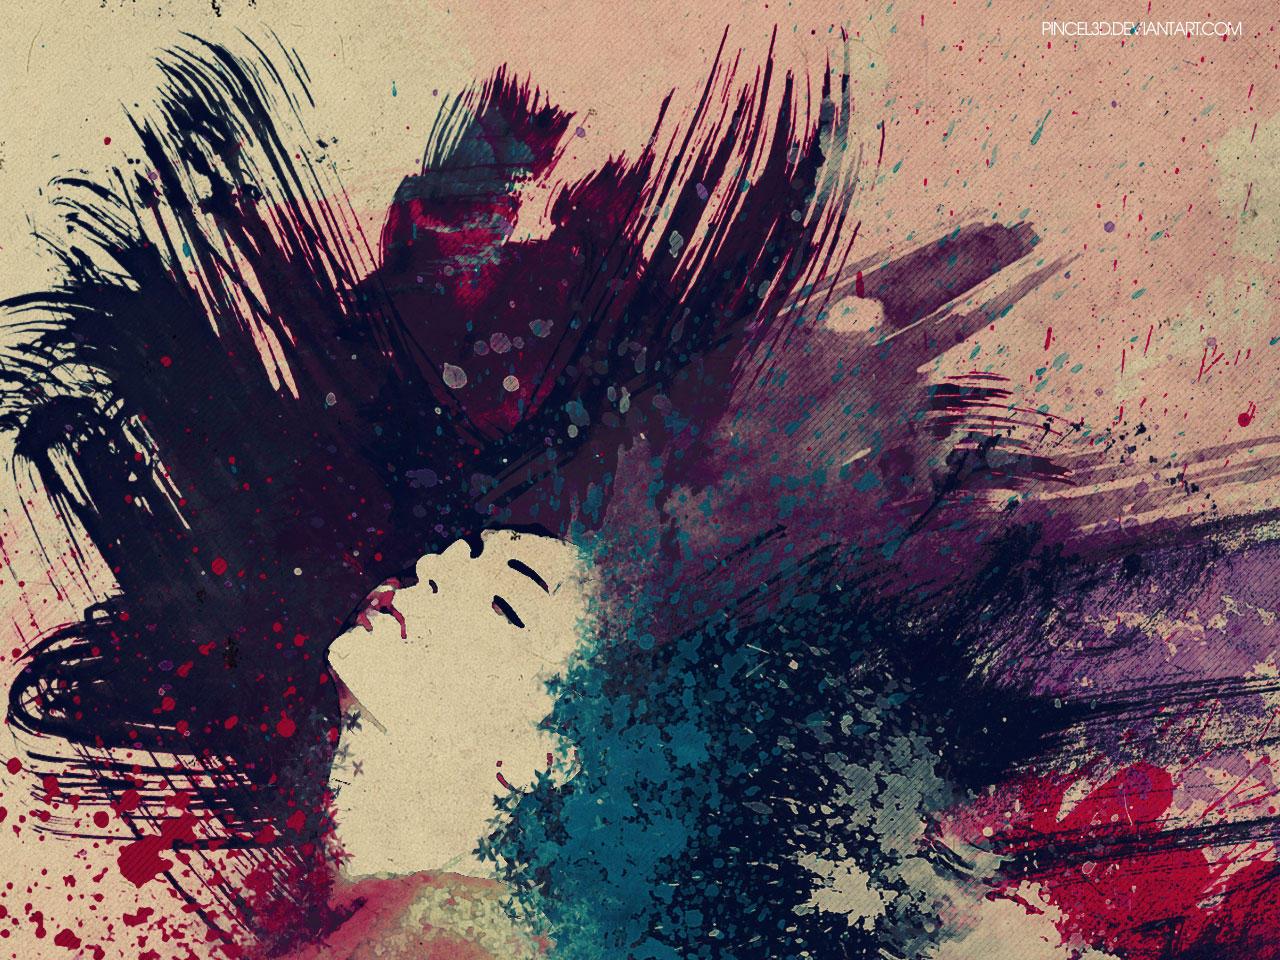 passion wallpaper forwallpapercom - photo #4